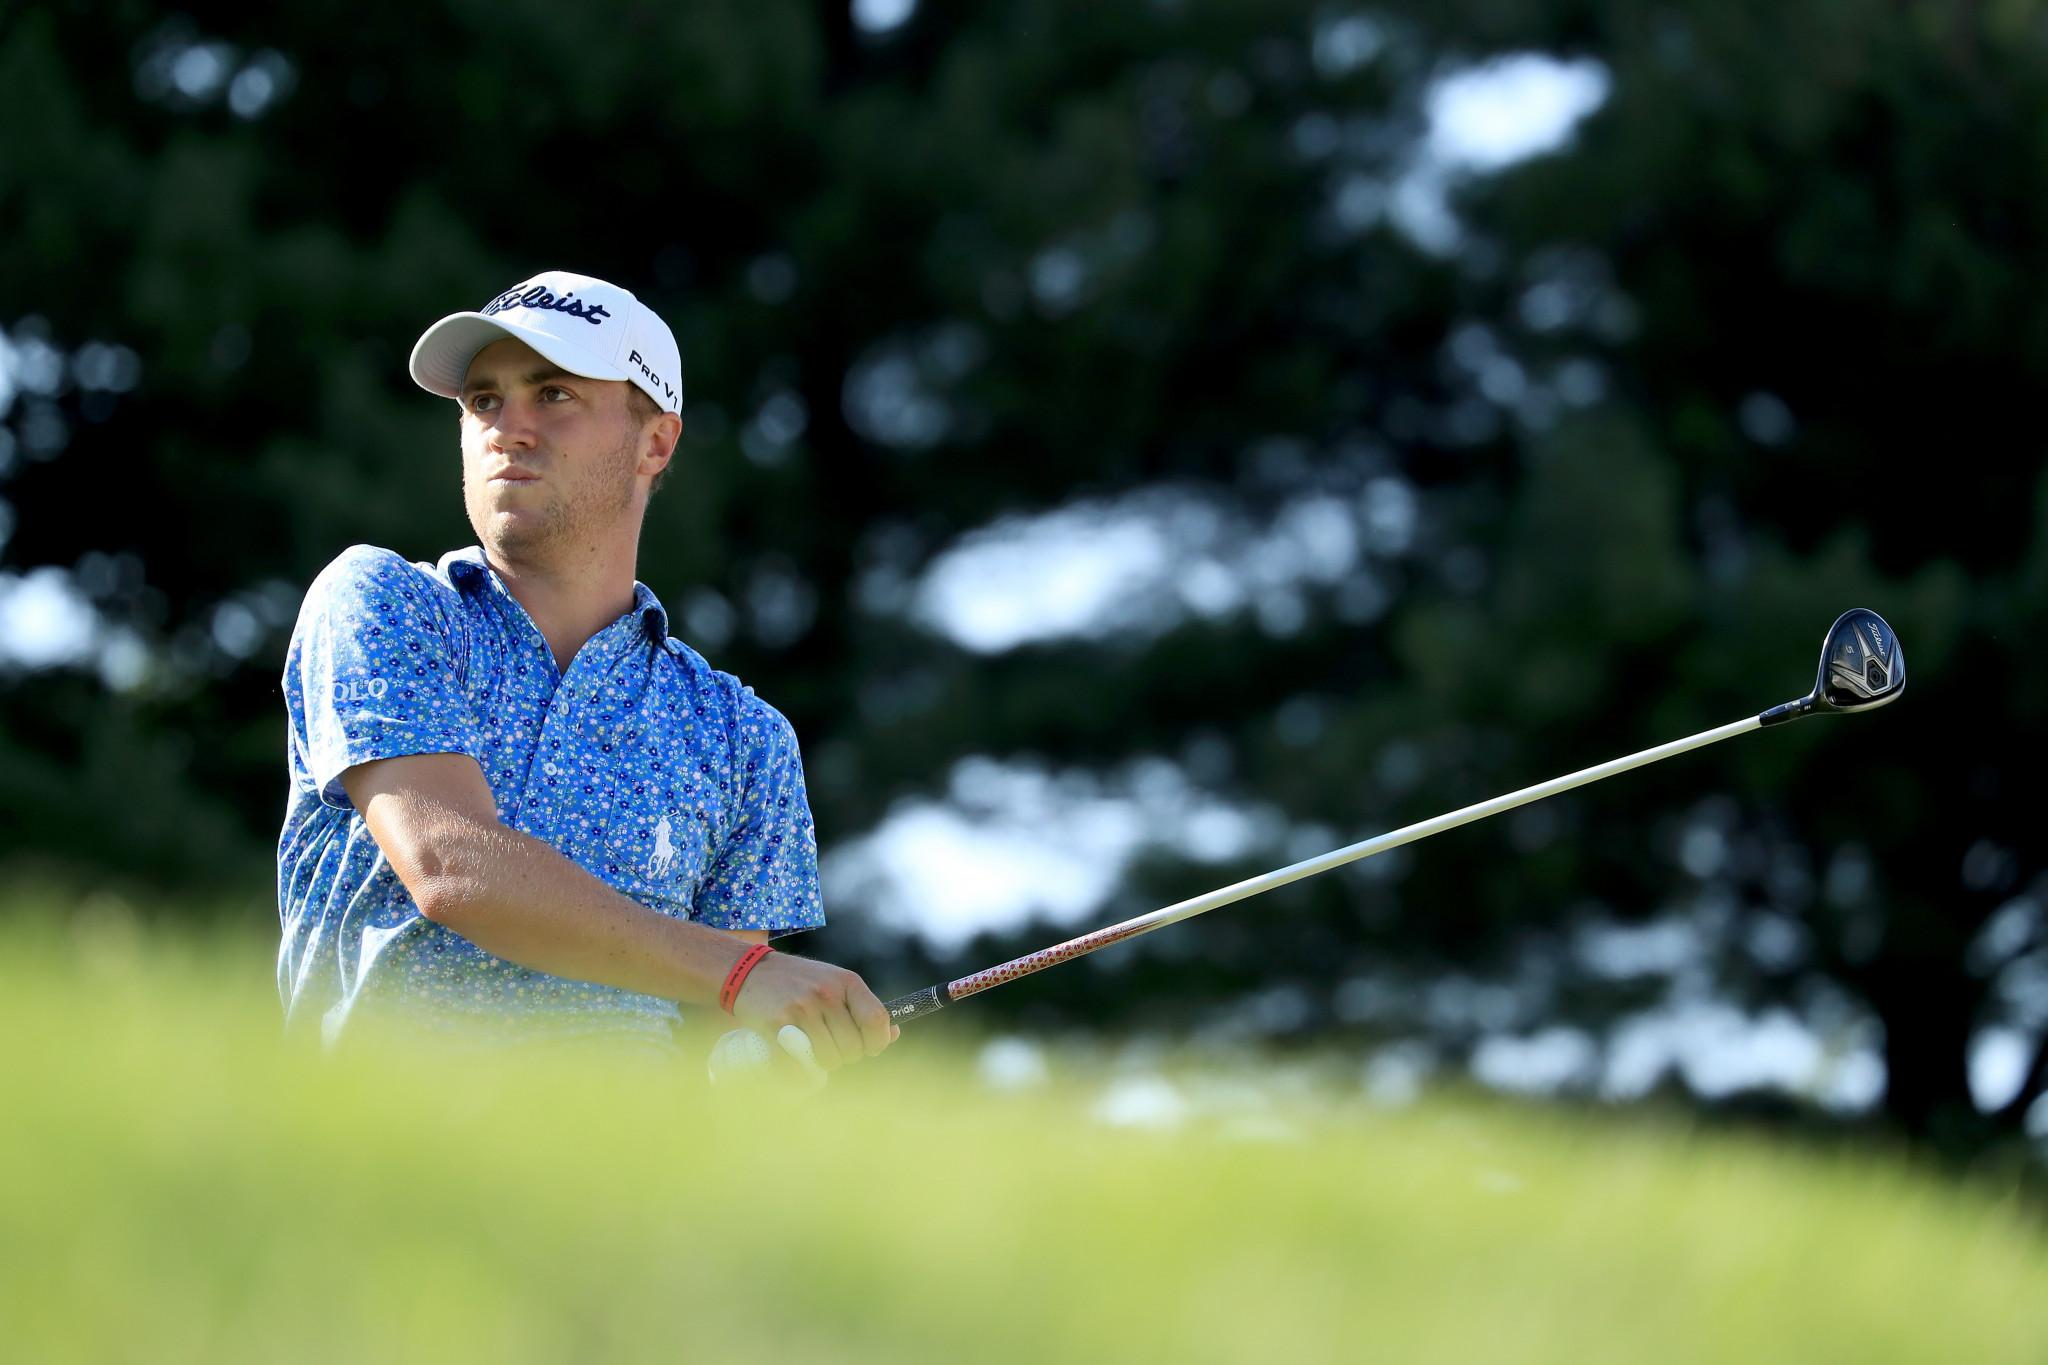 Thomas holds three shot lead at WGC-Bridgestone Invitational